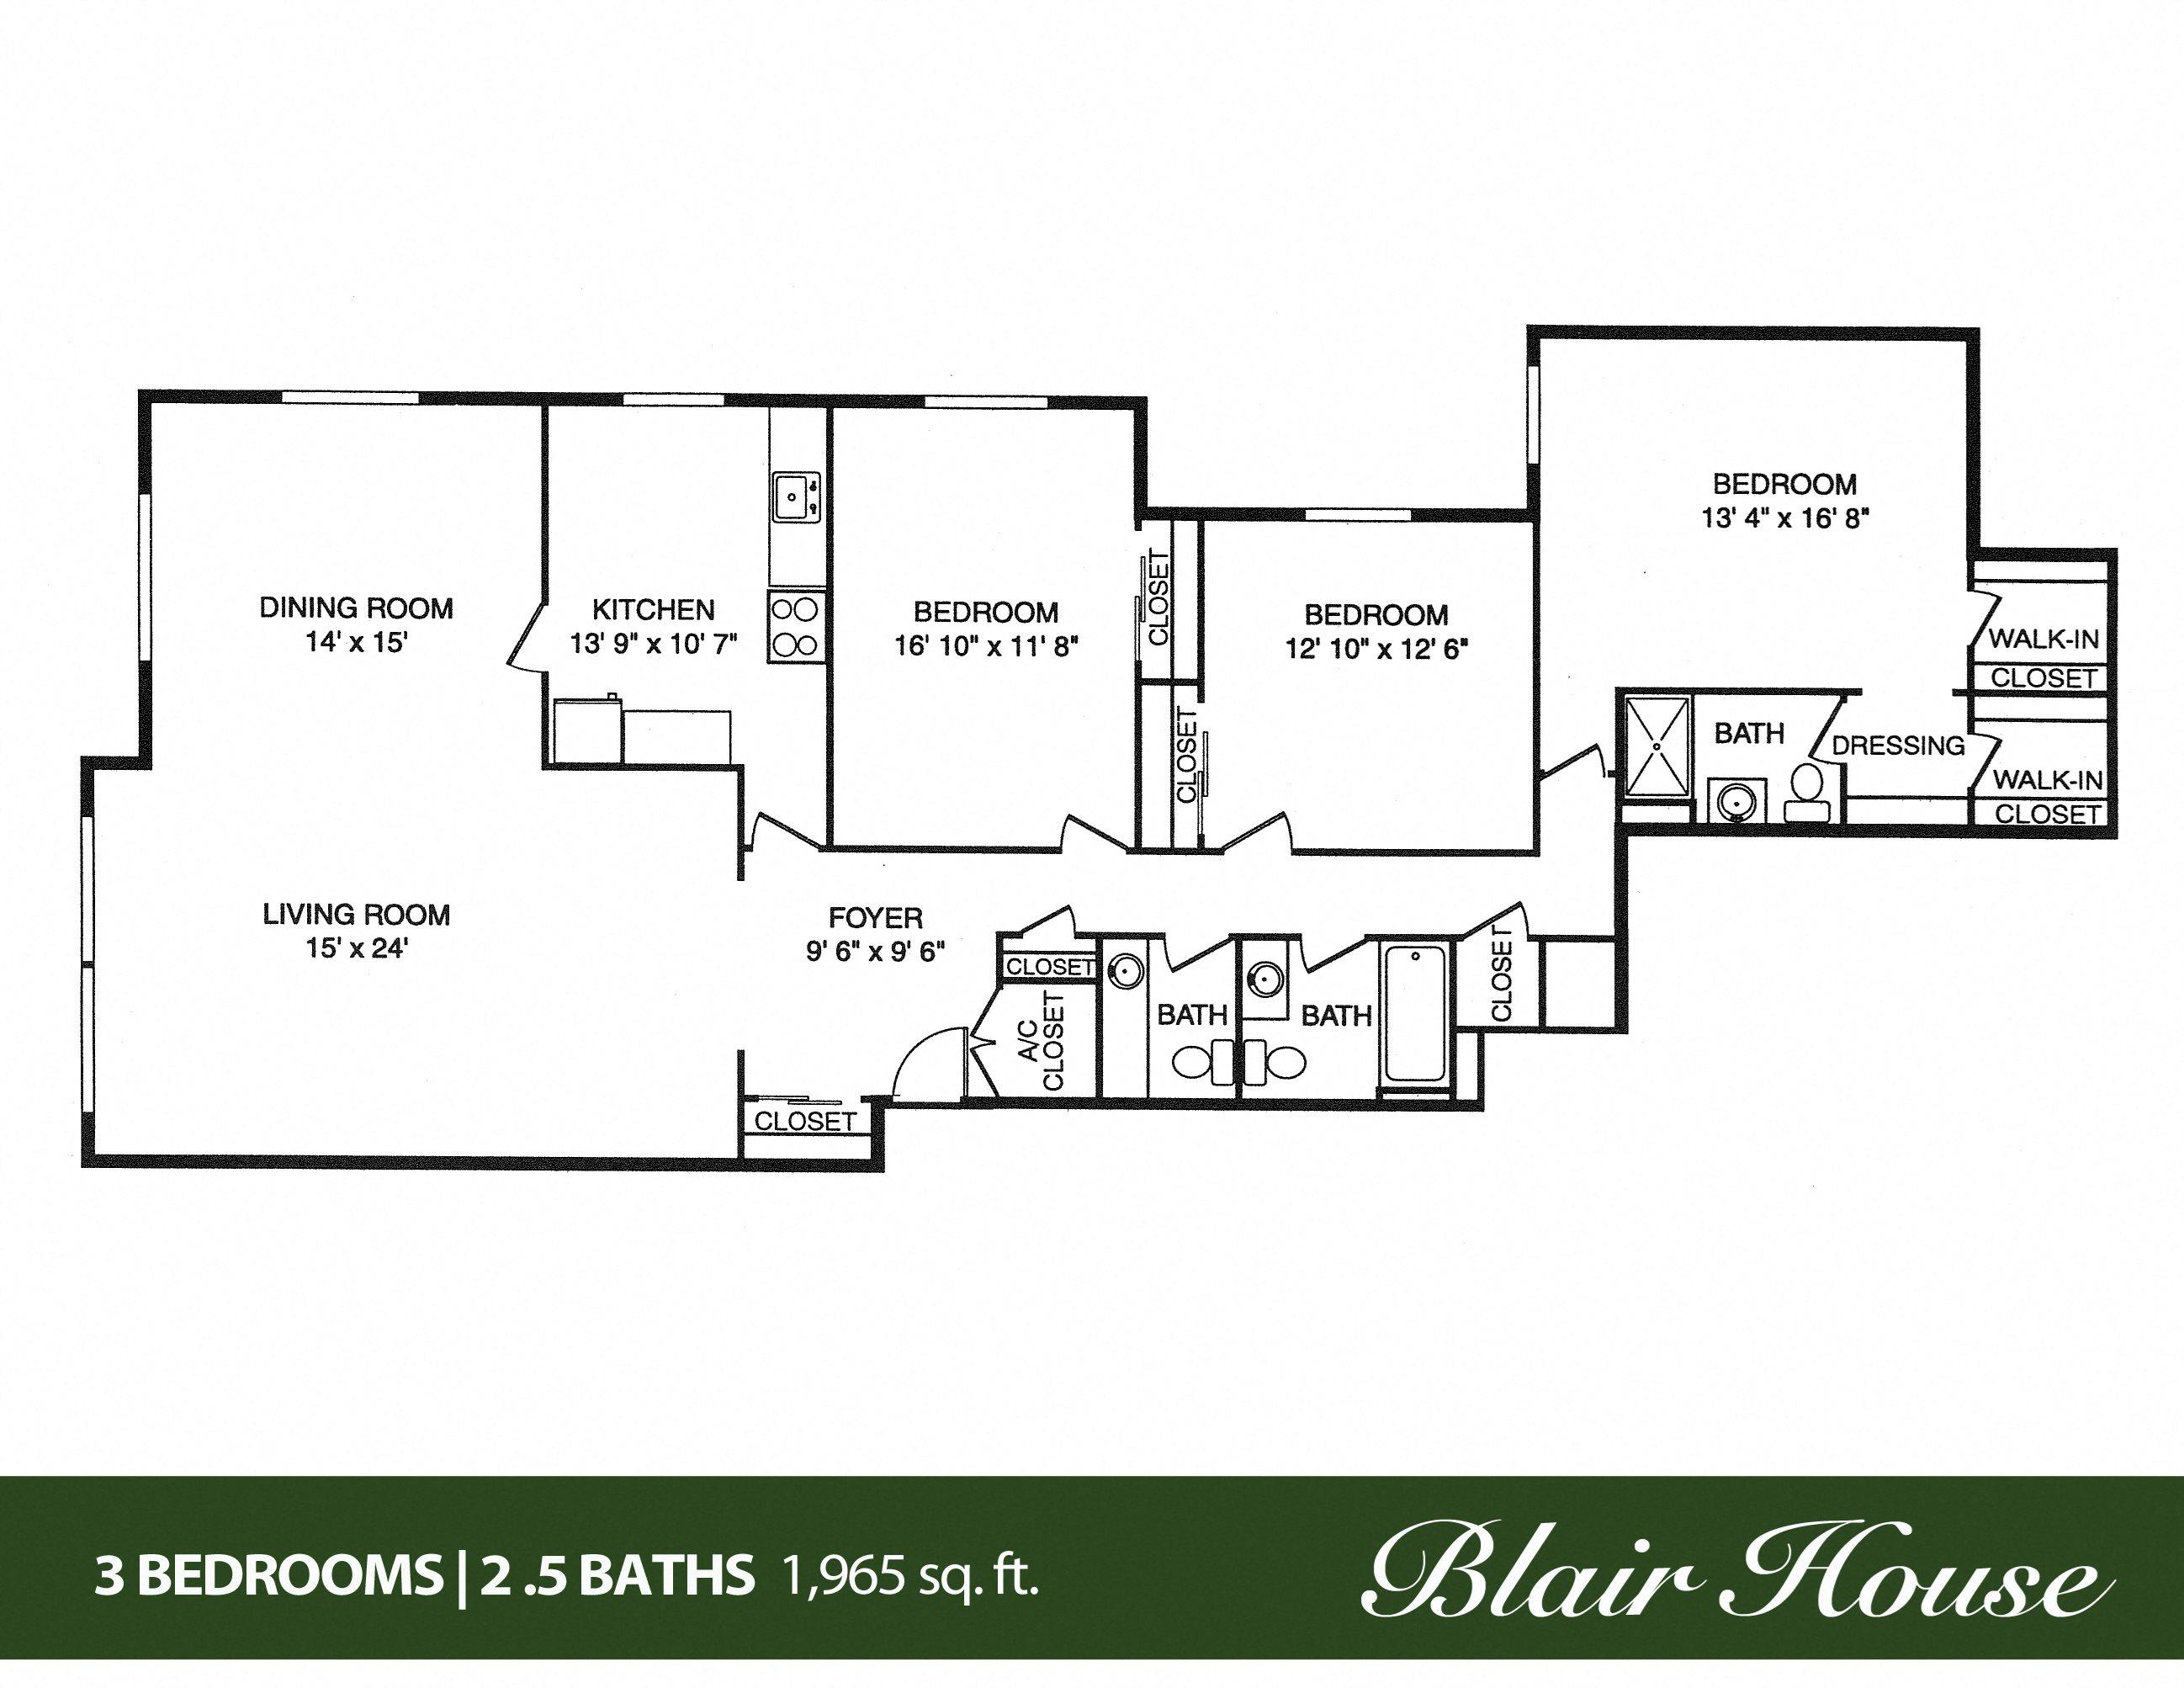 Blair House Apartments Ebrochure